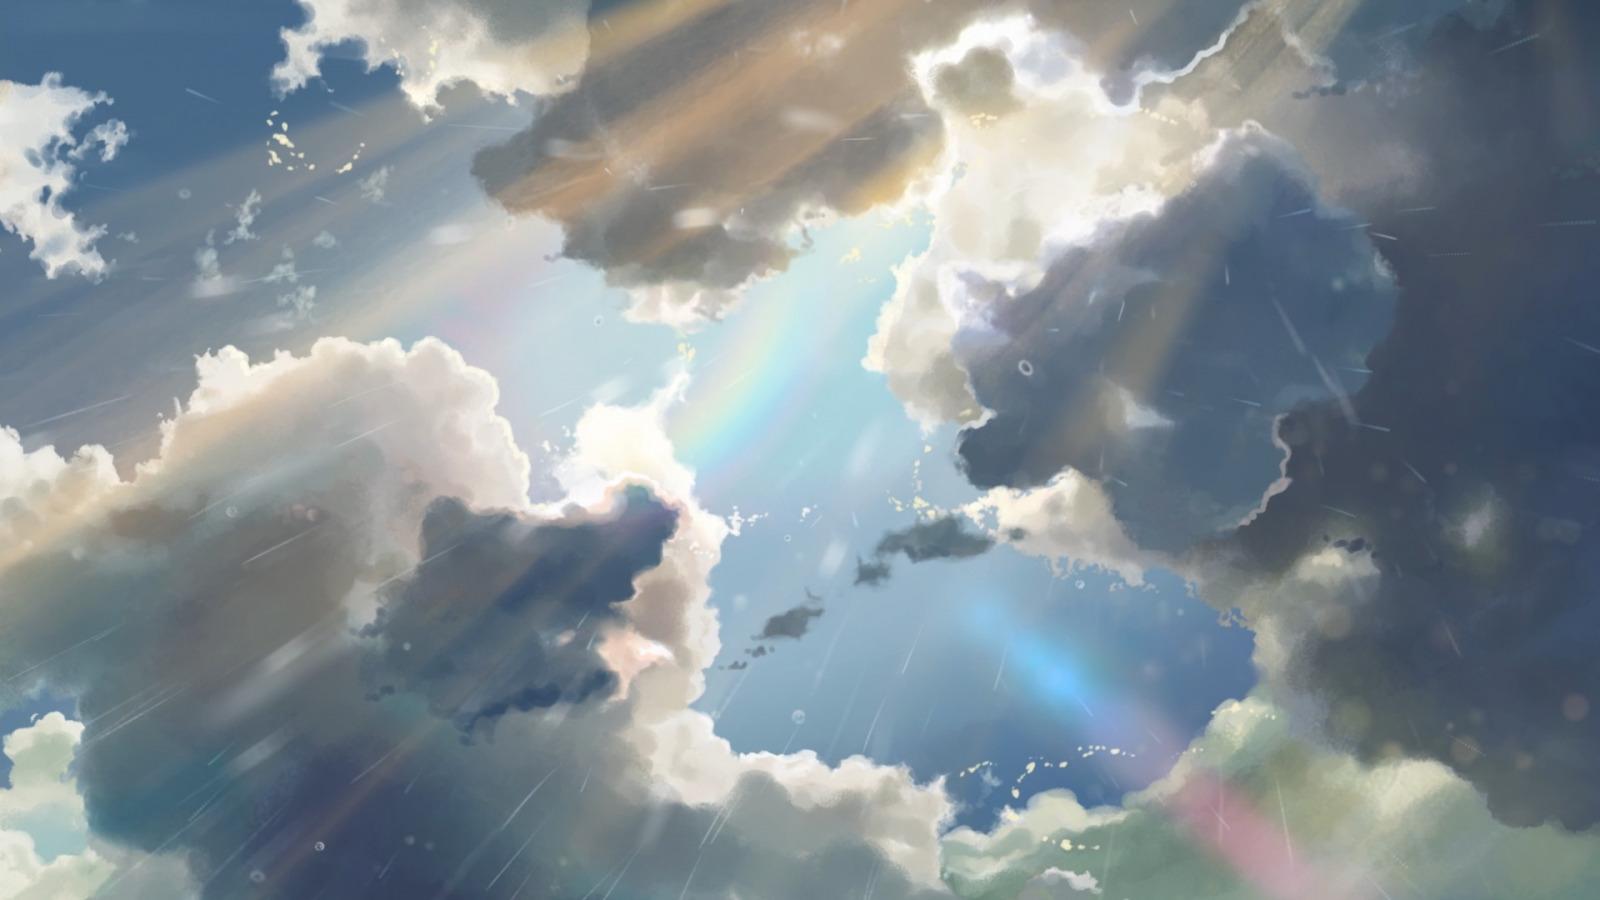 Download Wallpaper The Sun Sky Clouds Rain Anime